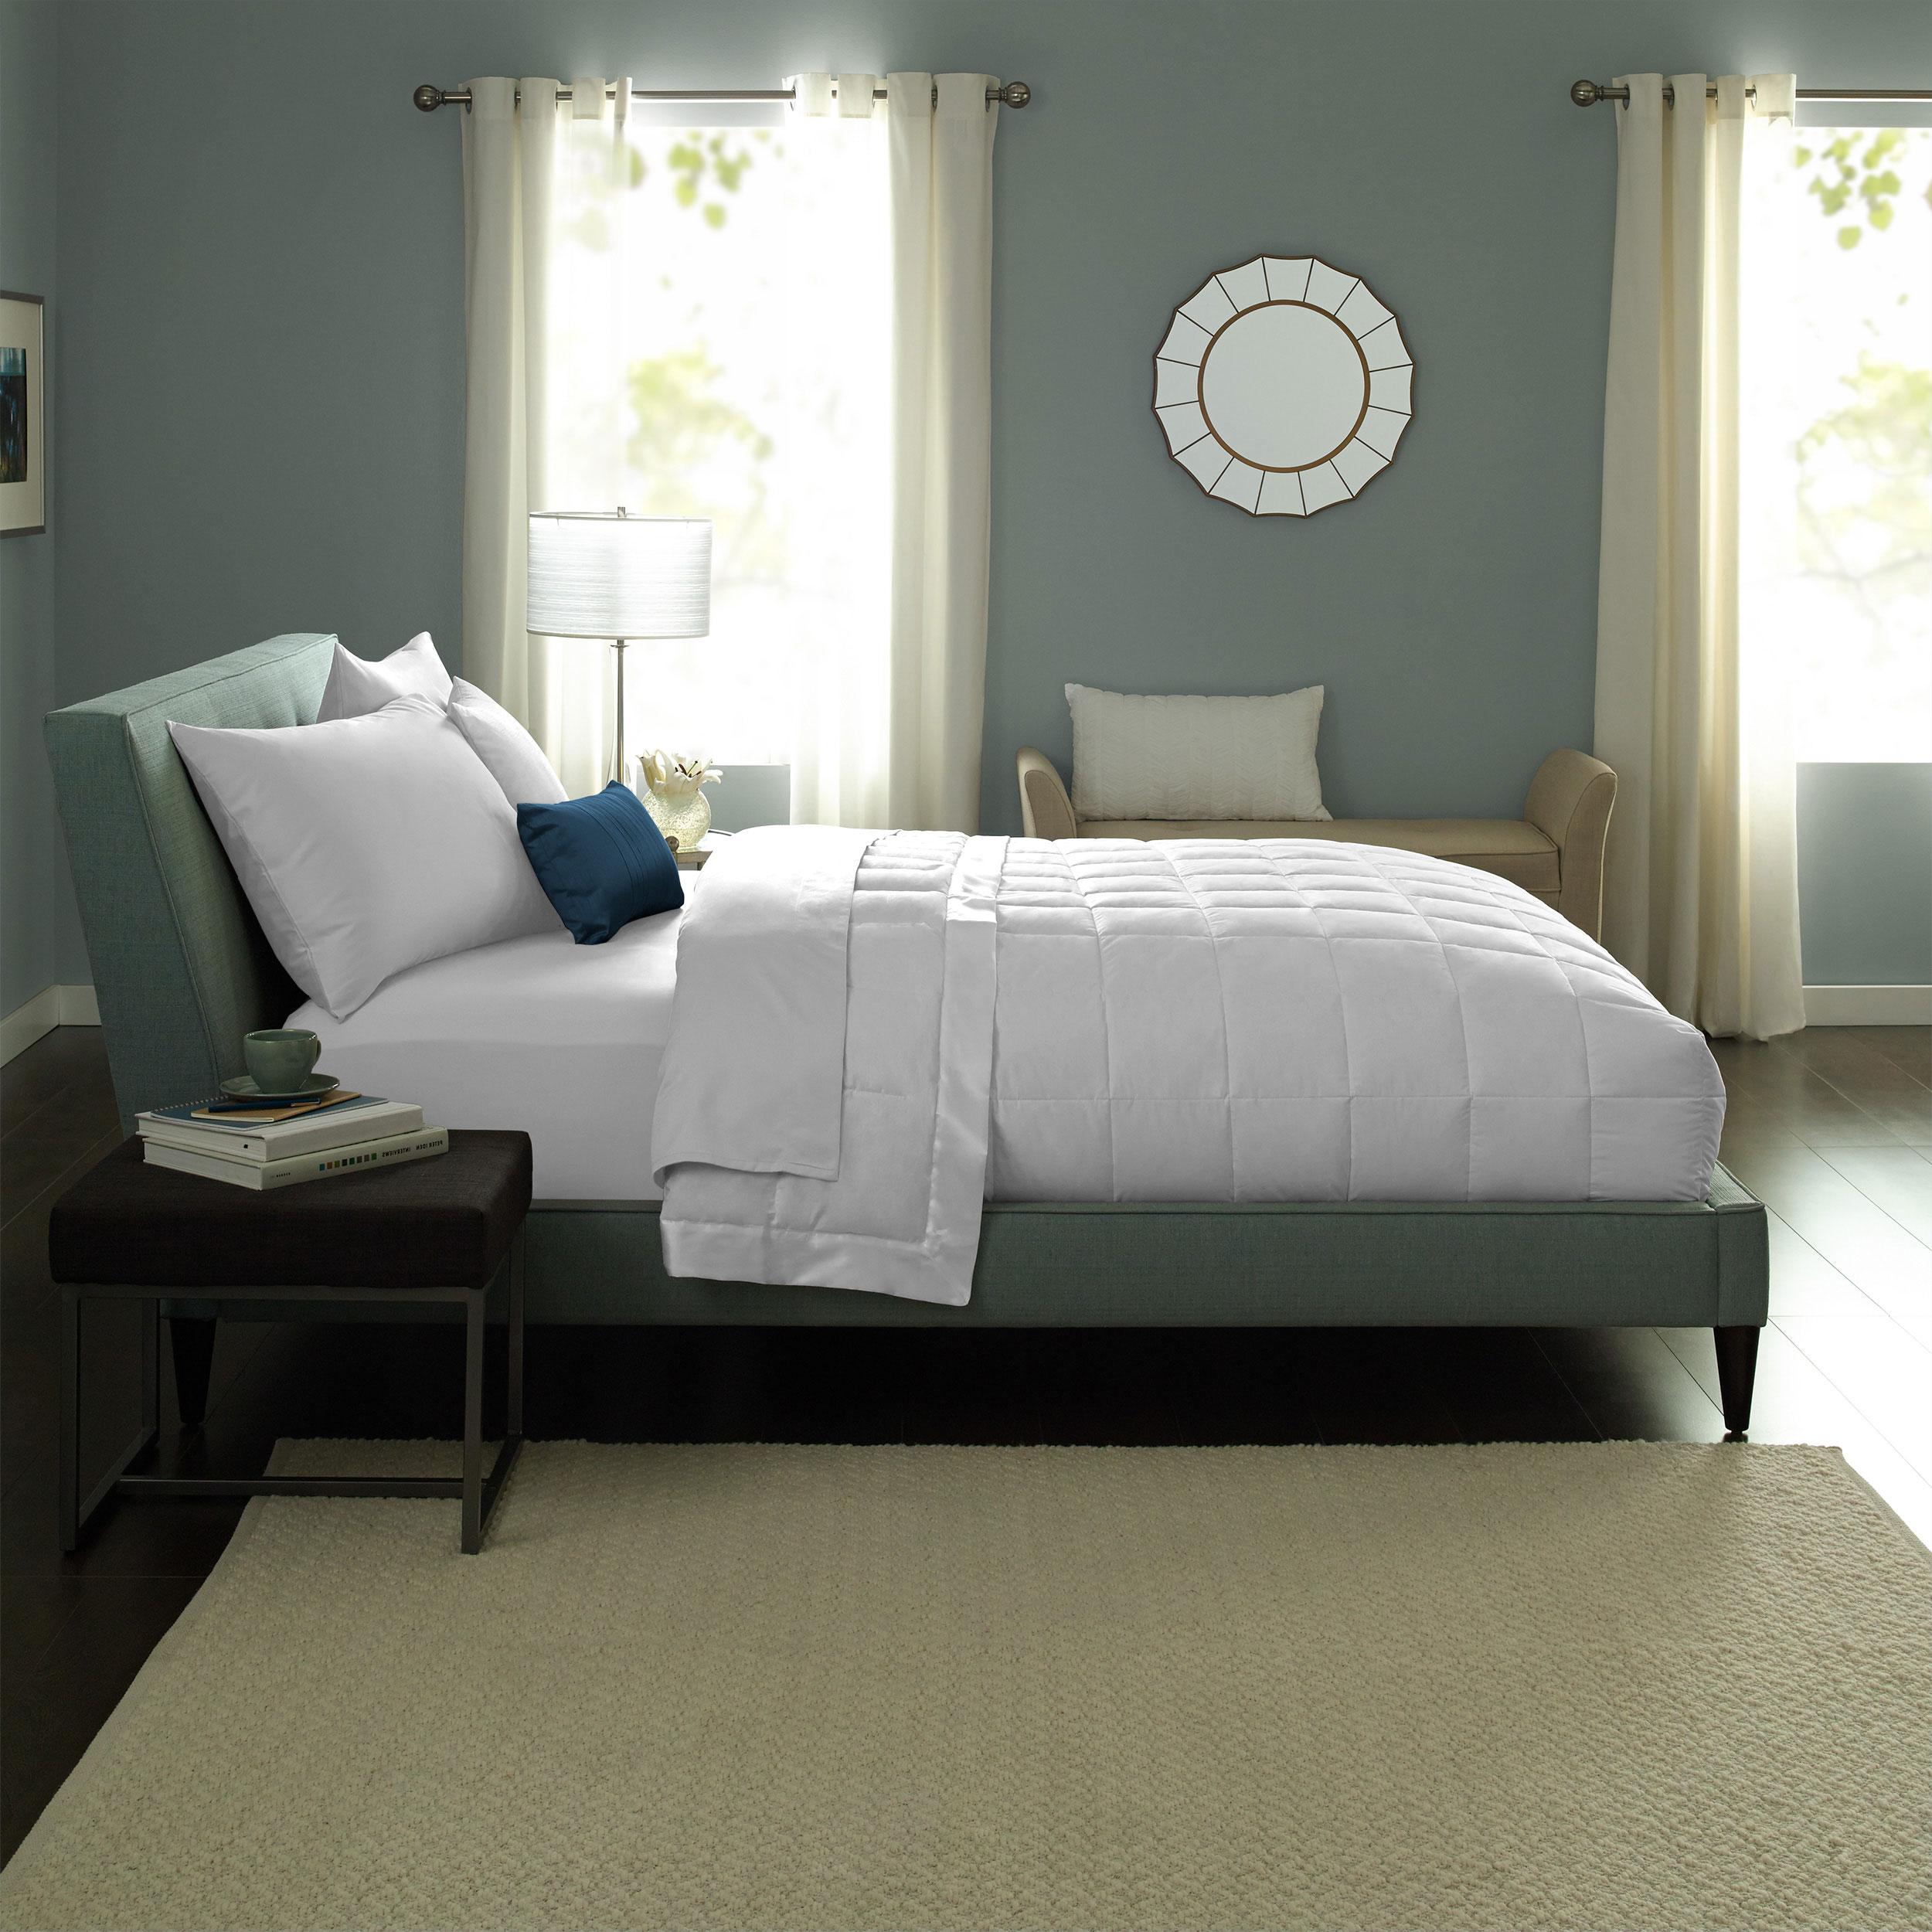 Colored Down Comforter Pacific Coast Bedding